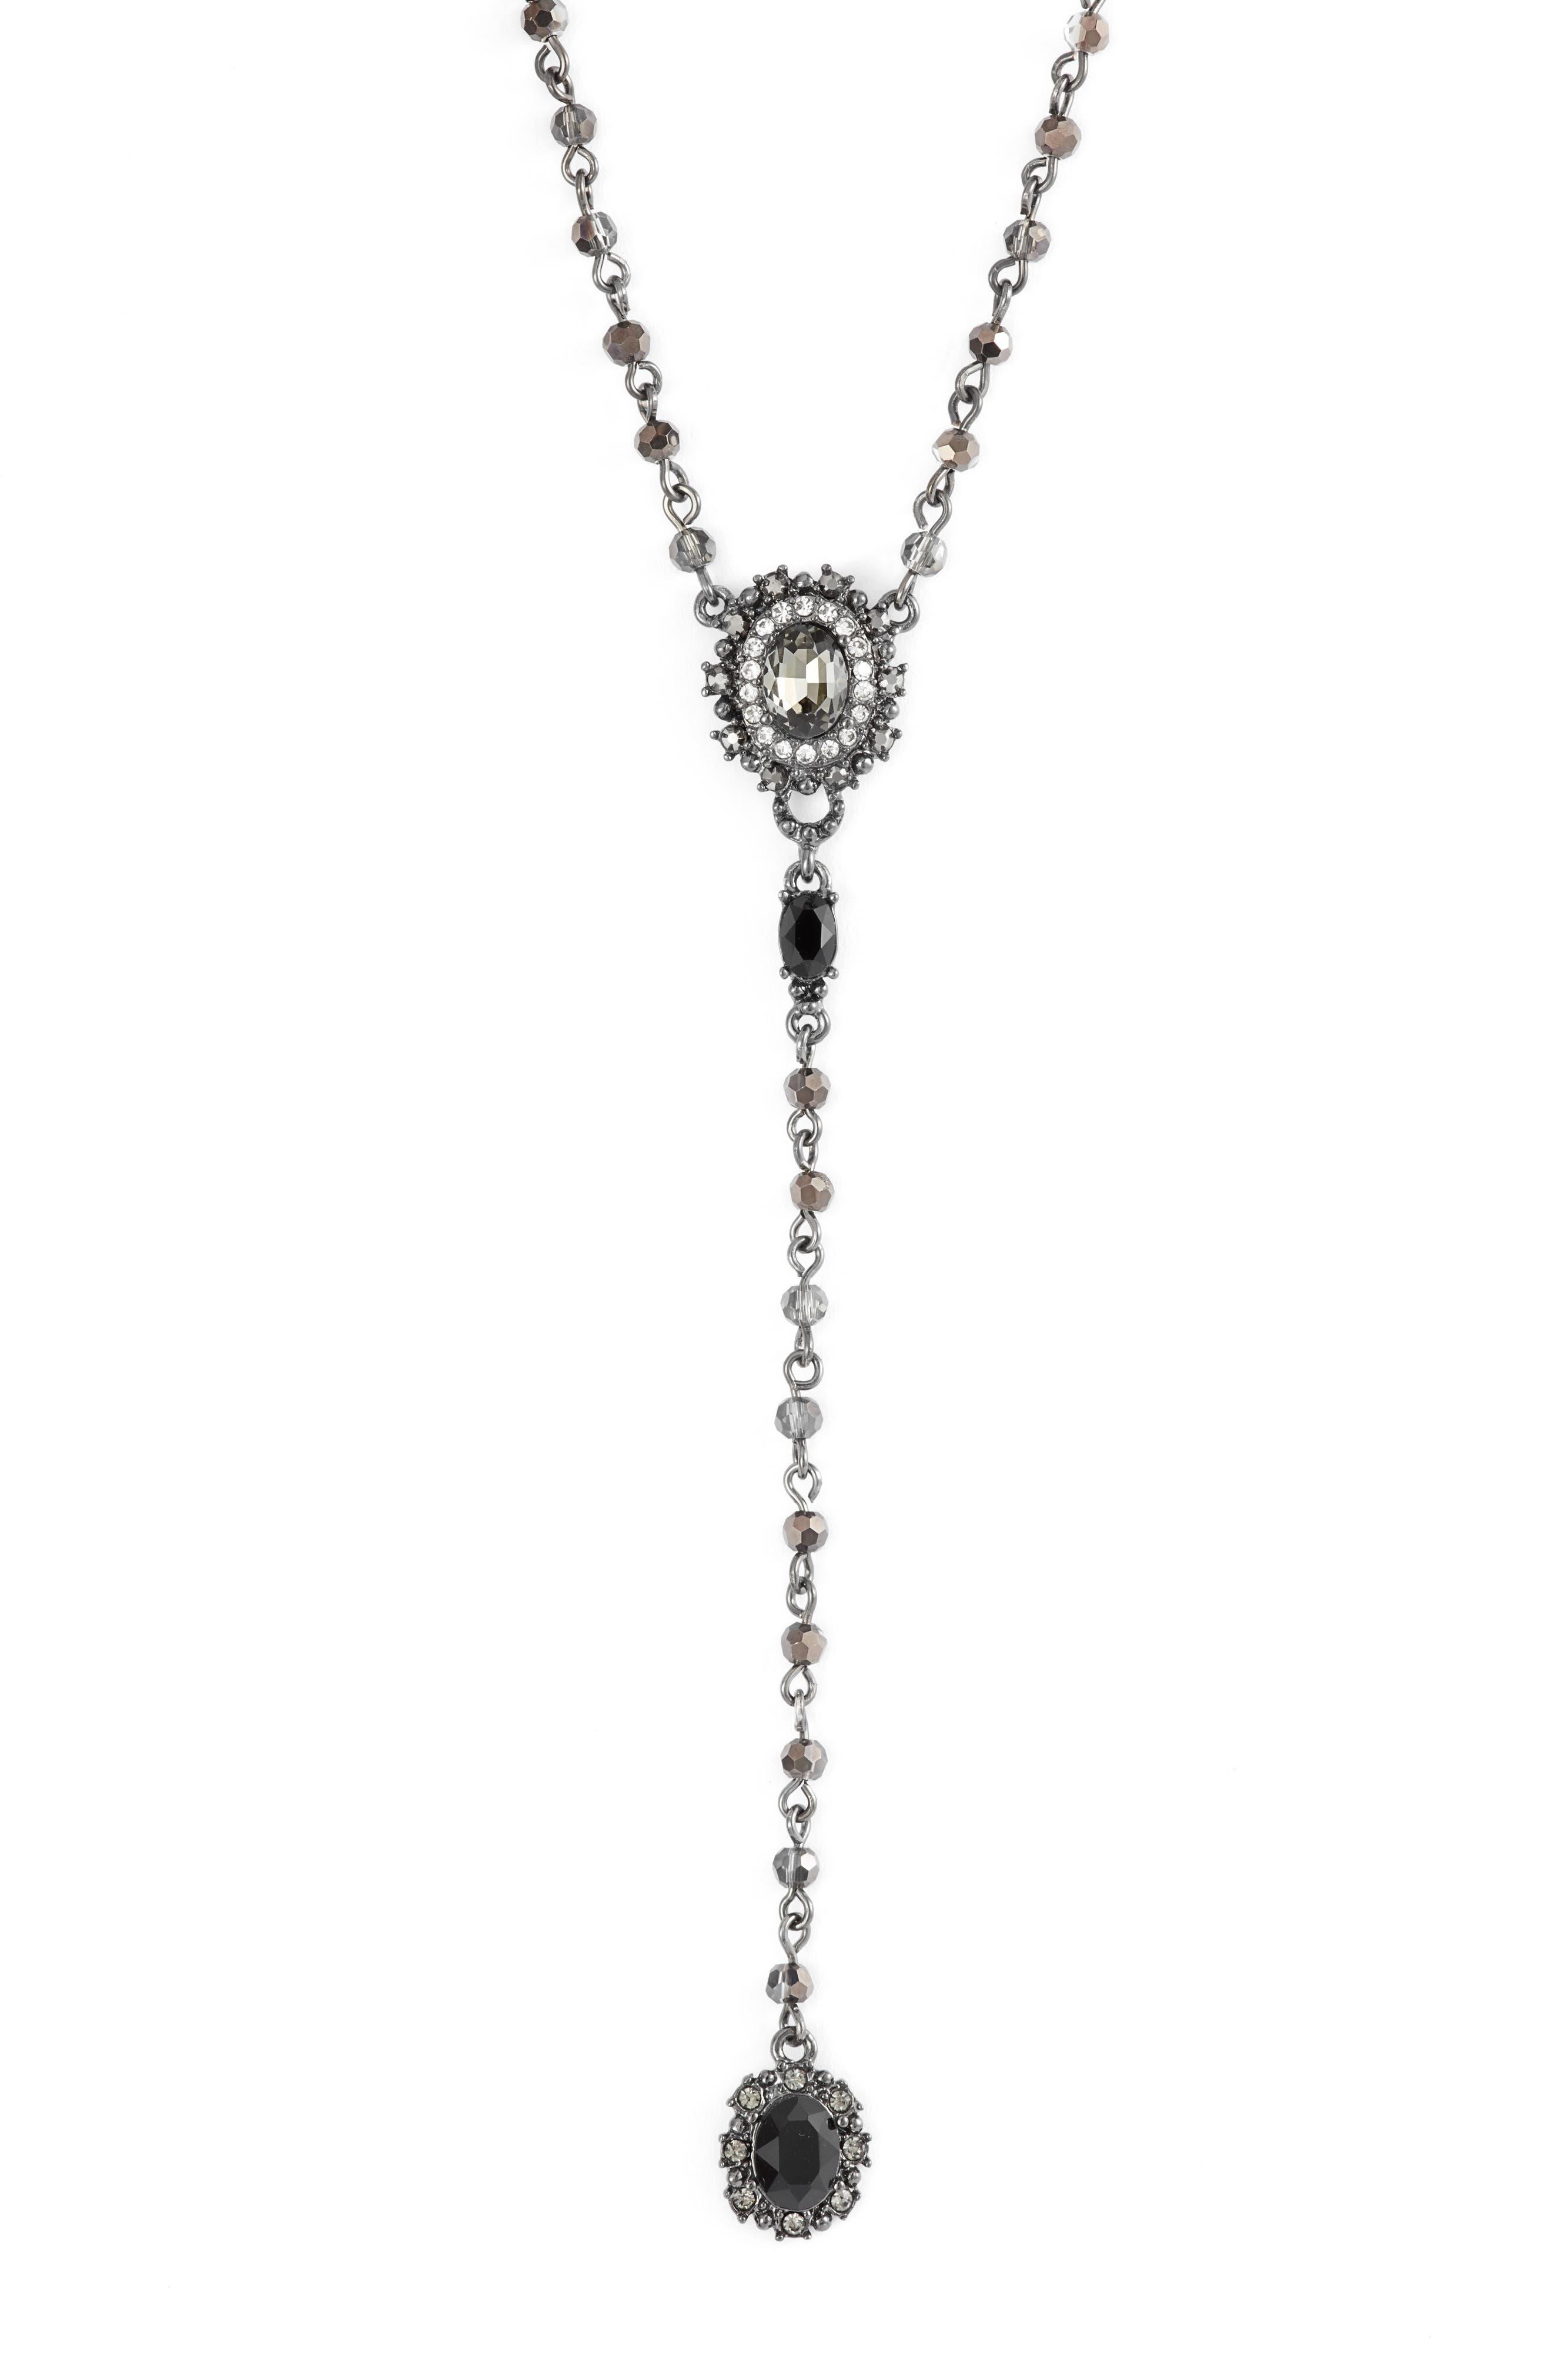 MARCHESA, Crystal Y-Necklace, Main thumbnail 1, color, JET/ HEMATITE